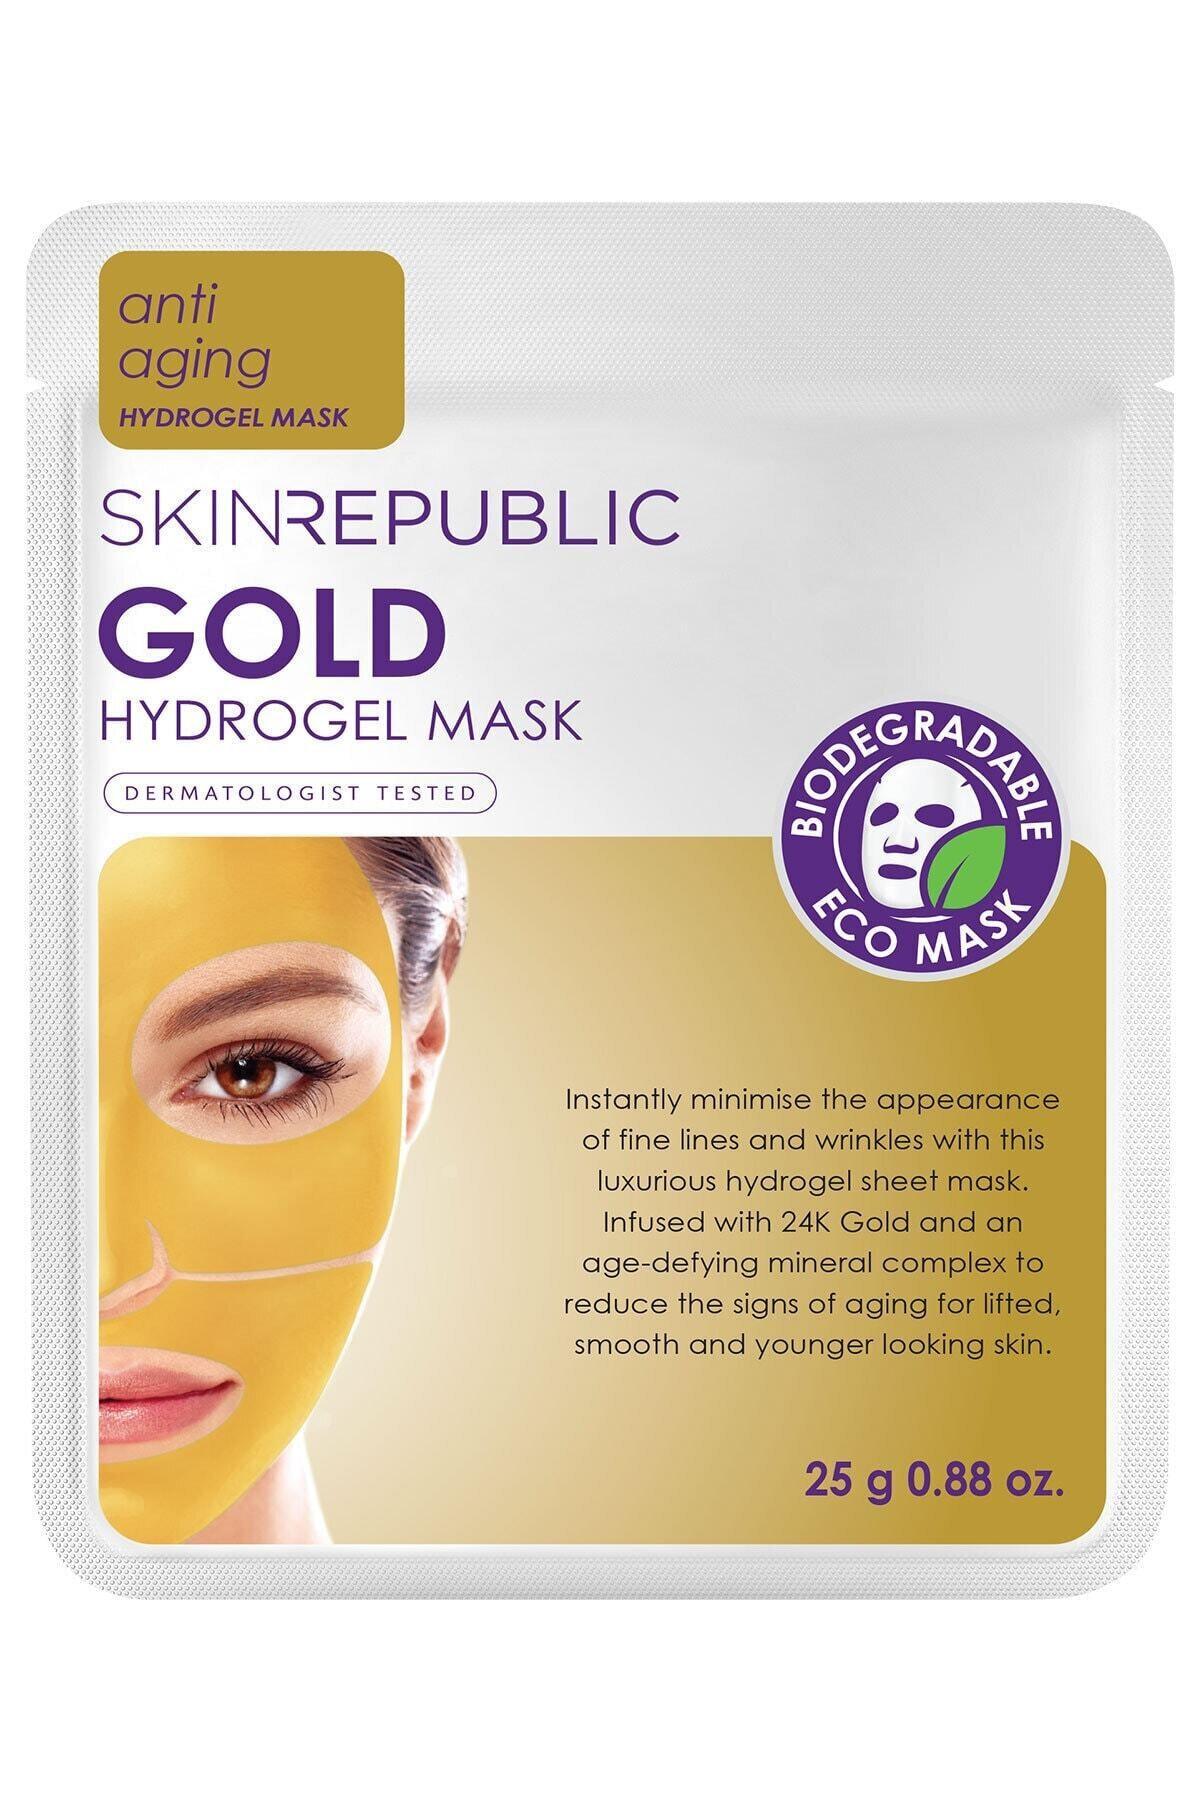 Skin Republic Gold Hydrogel Mask Sheet 25g 1